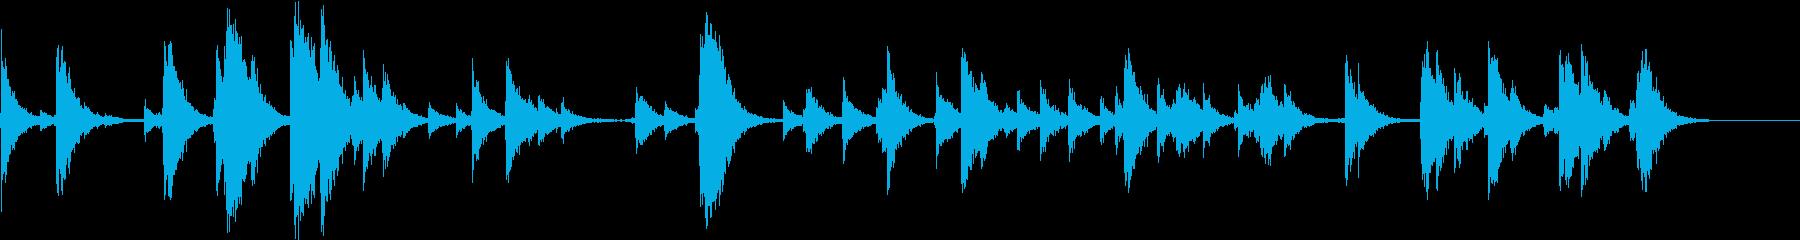 SFX 反響の大きな場所の階段を降る音の再生済みの波形